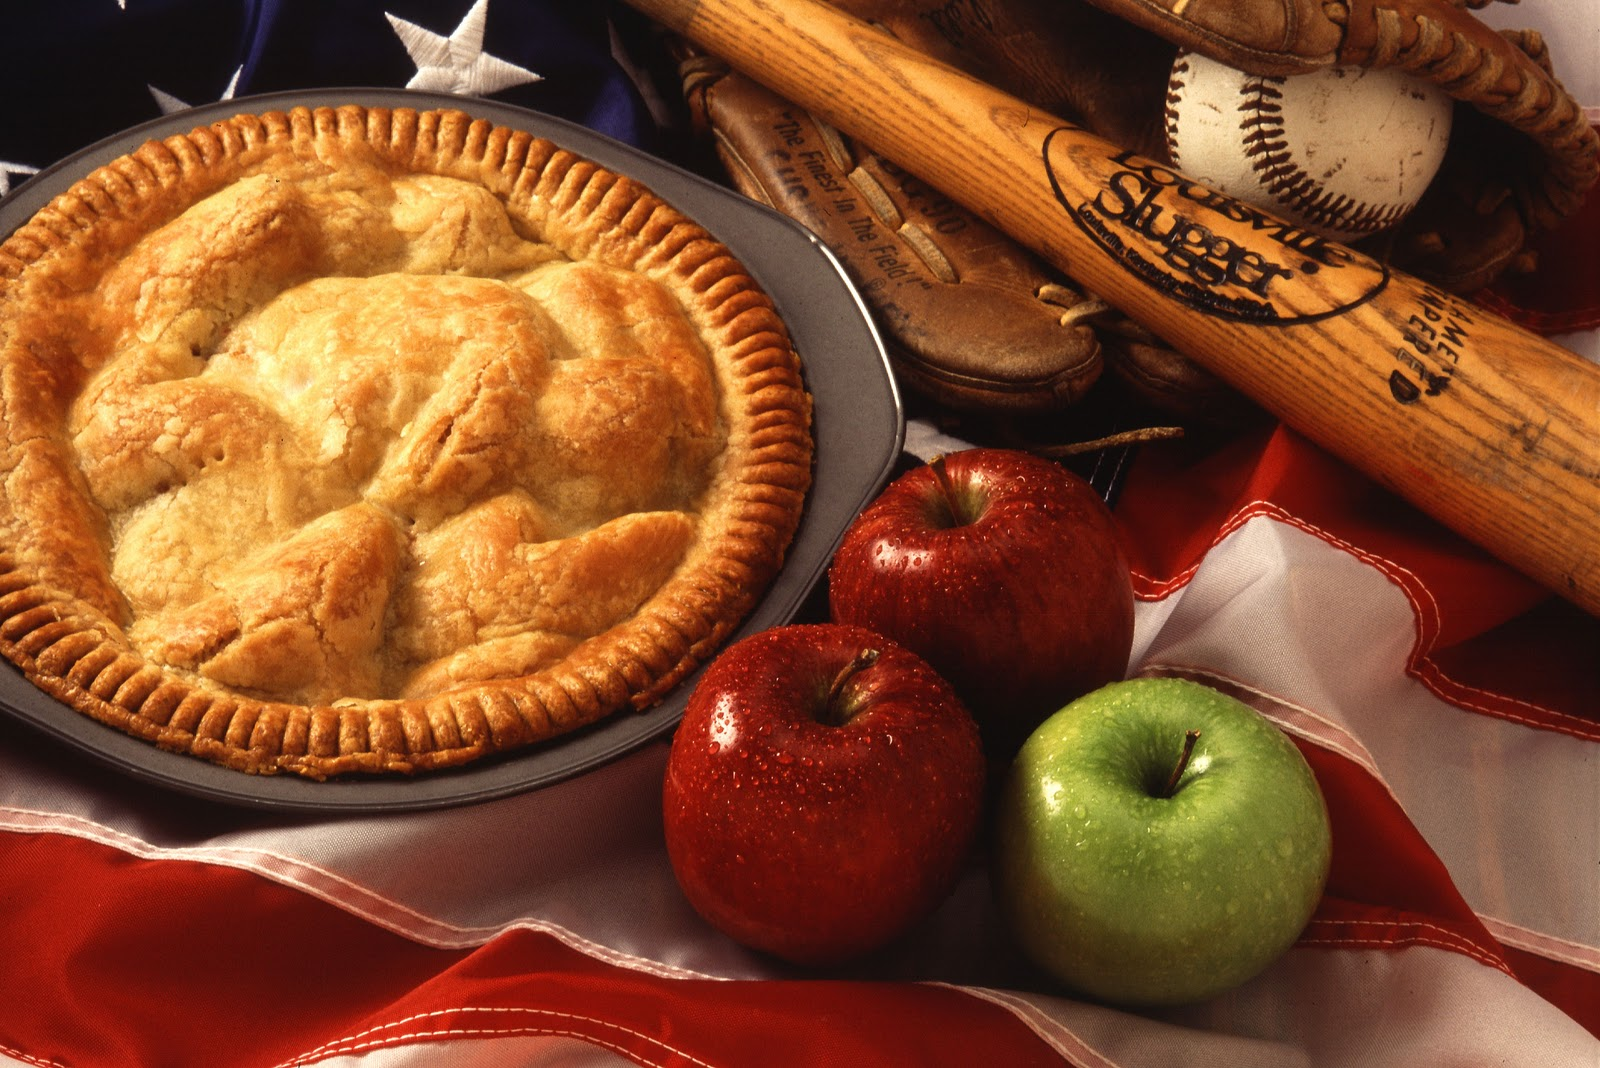 http://3.bp.blogspot.com/-lLEAuLt_iw8/TvPTVanA8NI/AAAAAAAAAII/9c04ohR15kM/s1600/const+Motherhood_and_apple_pie.jpg